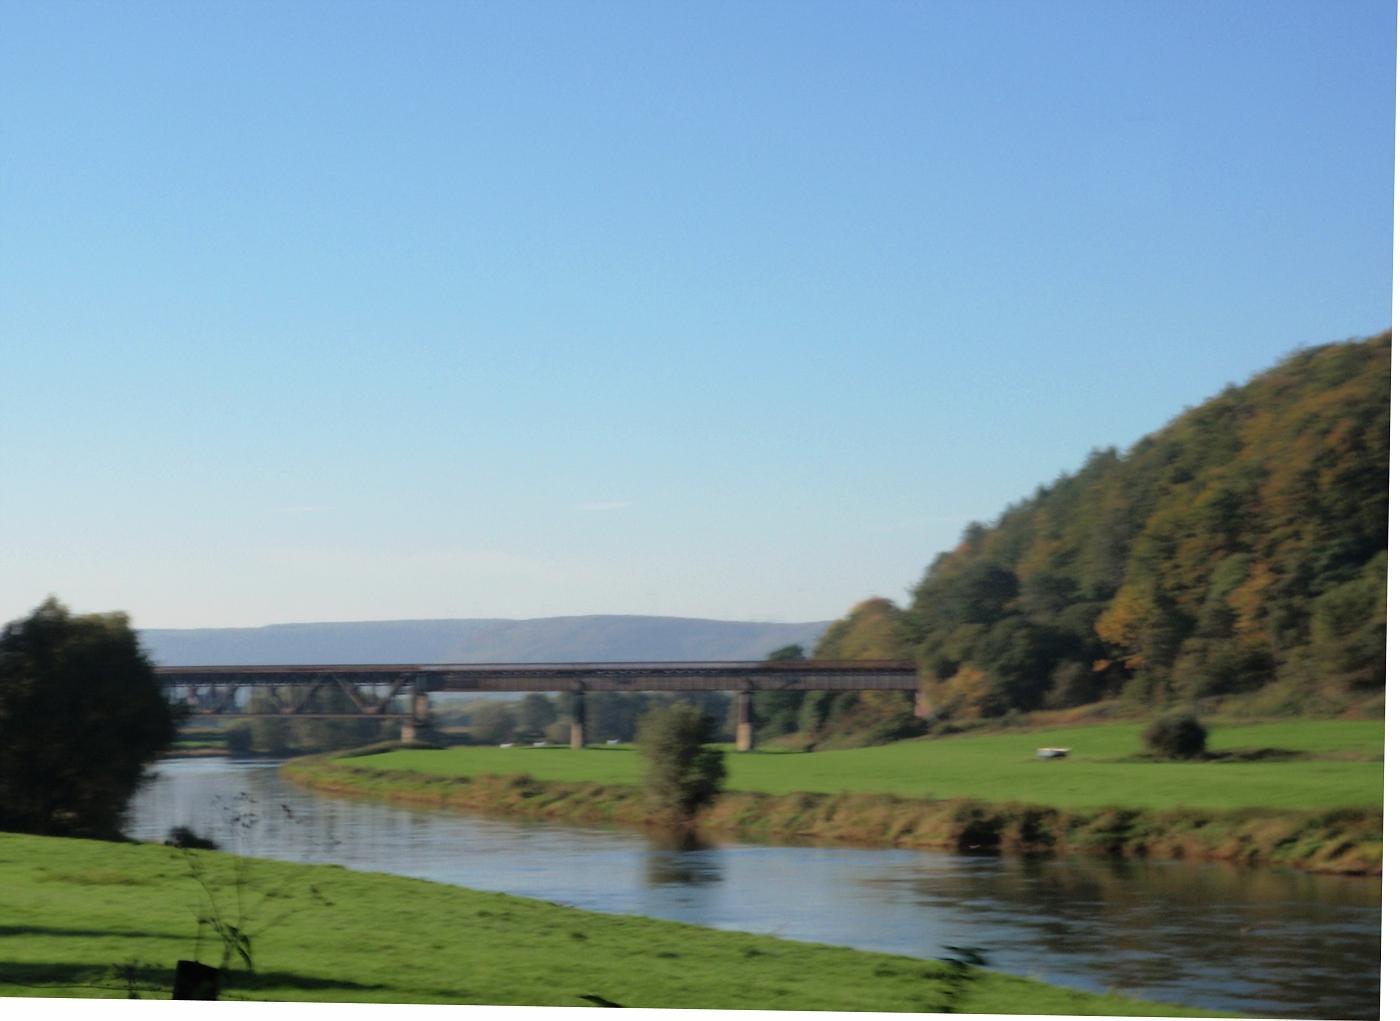 Eisenbahnbrücke Meinbrexen